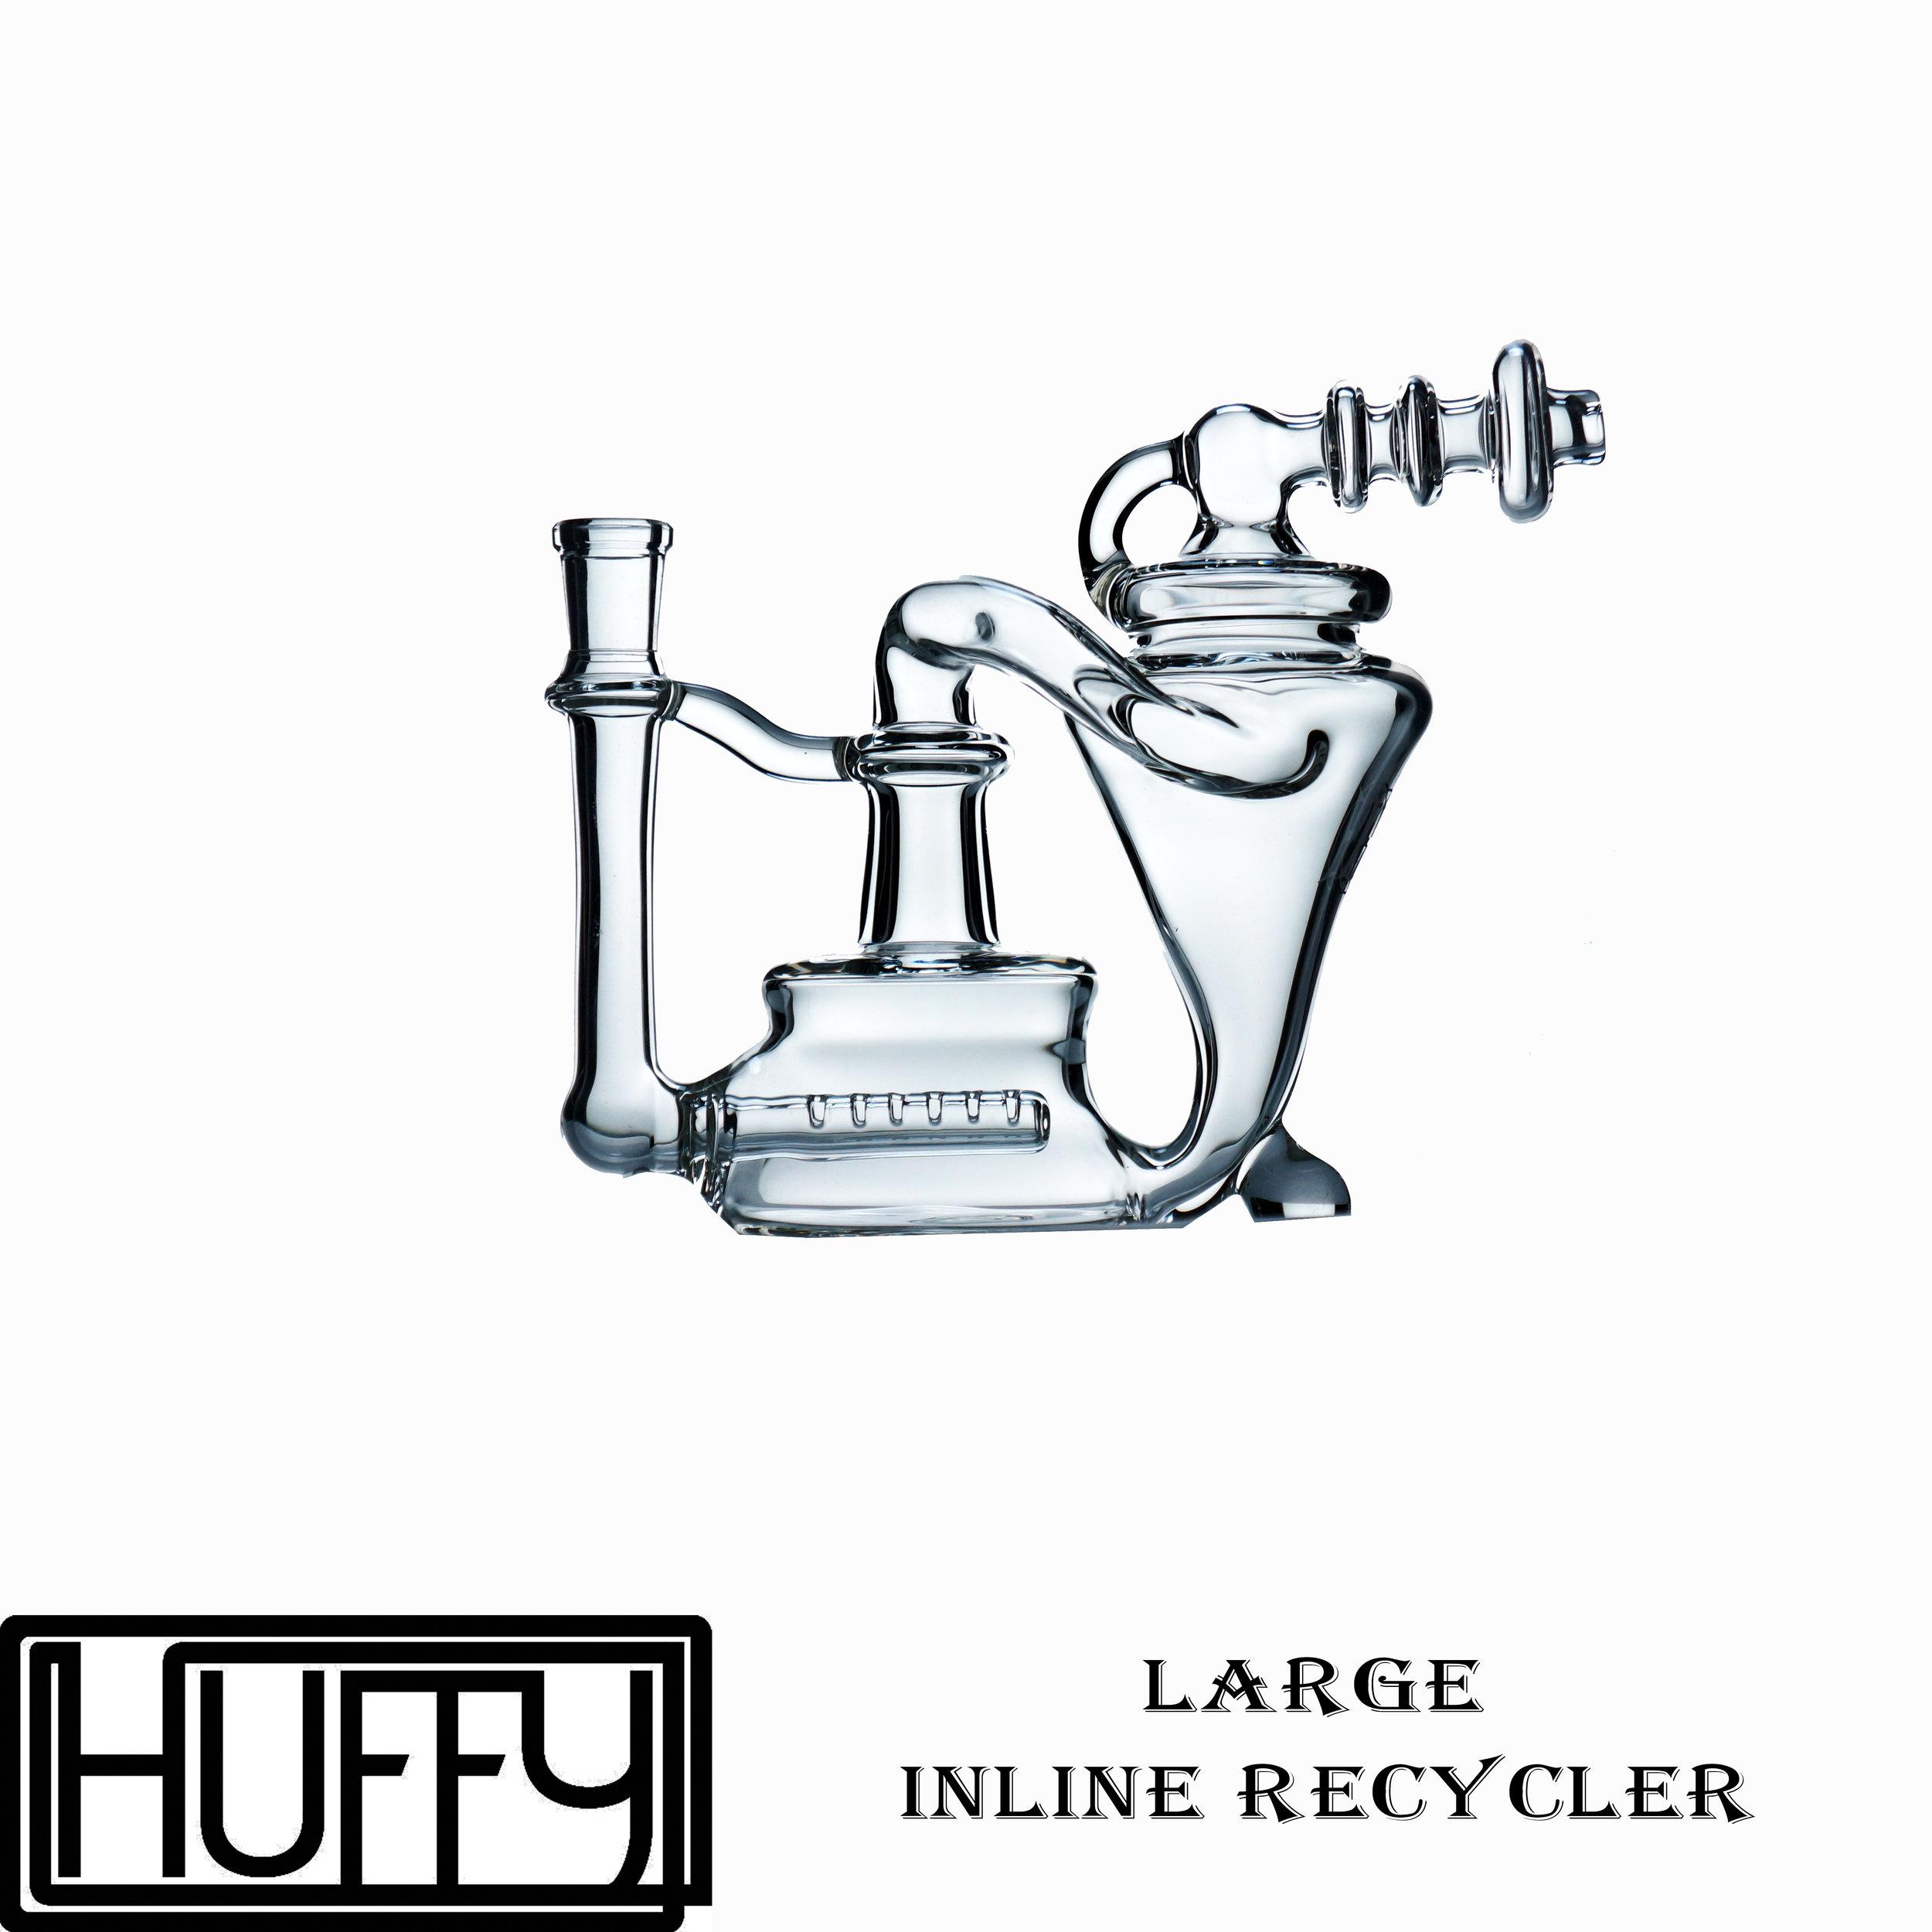 Medium Inline Recycler Whole Sale Price:160  Large Inline Recycler Whole Sale Price: $180